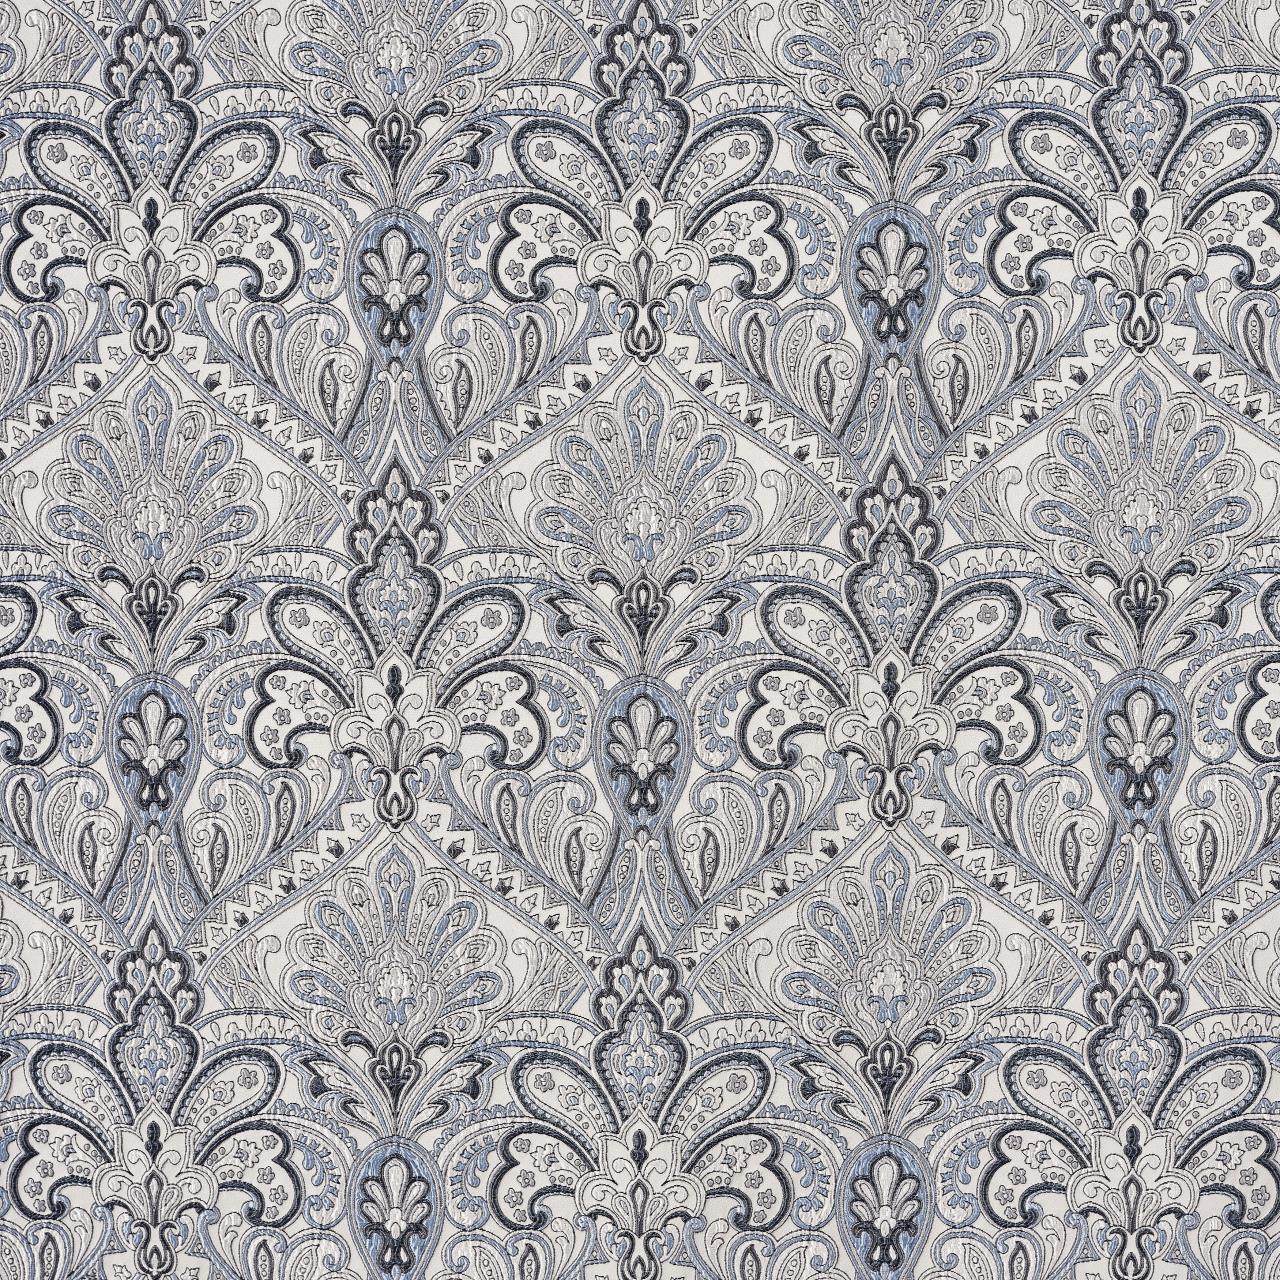 Alexis Powder Blue Comforter Set - 193842108642